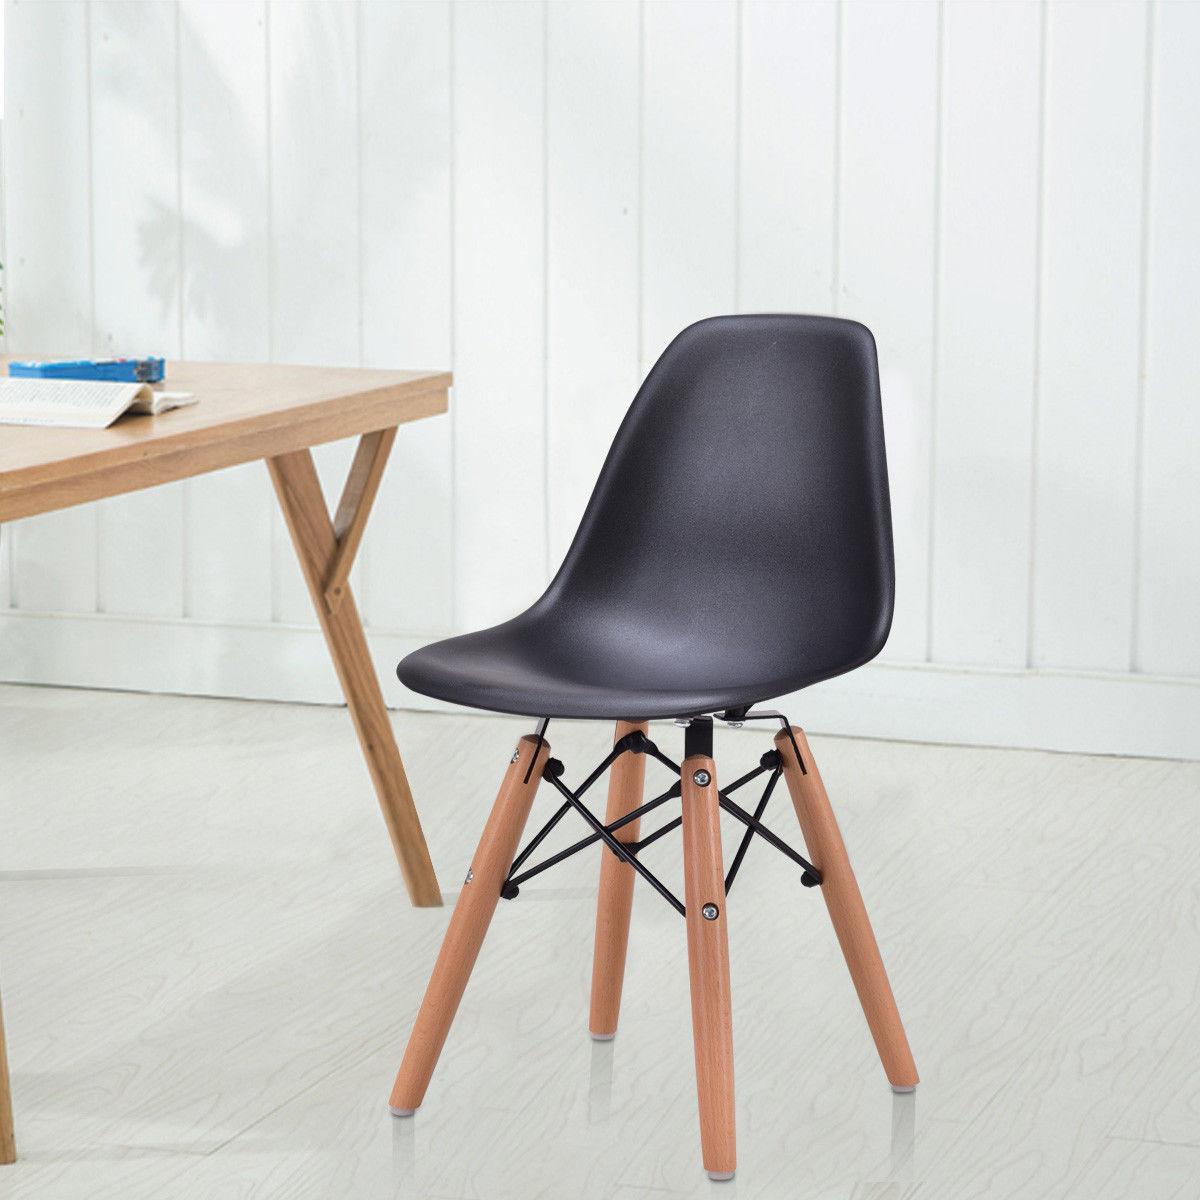 Giantex Modern Kids Dining Chair Children Side Armless Chair Molded Plastic Seat Wood Legs Children Furniture HW56499BK<br>